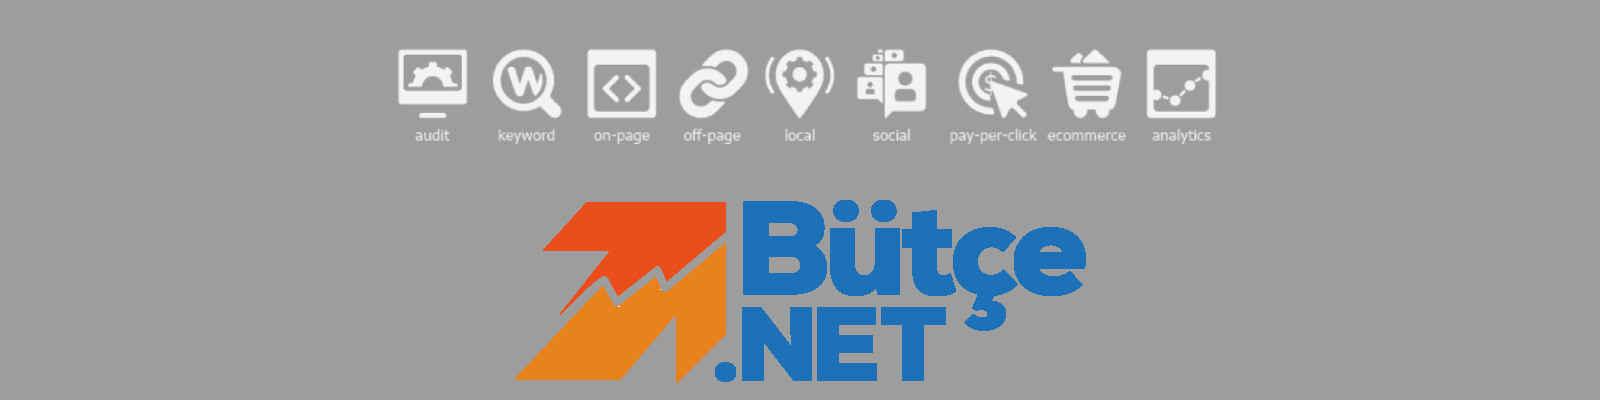 Bütçe.NET banner fotograf